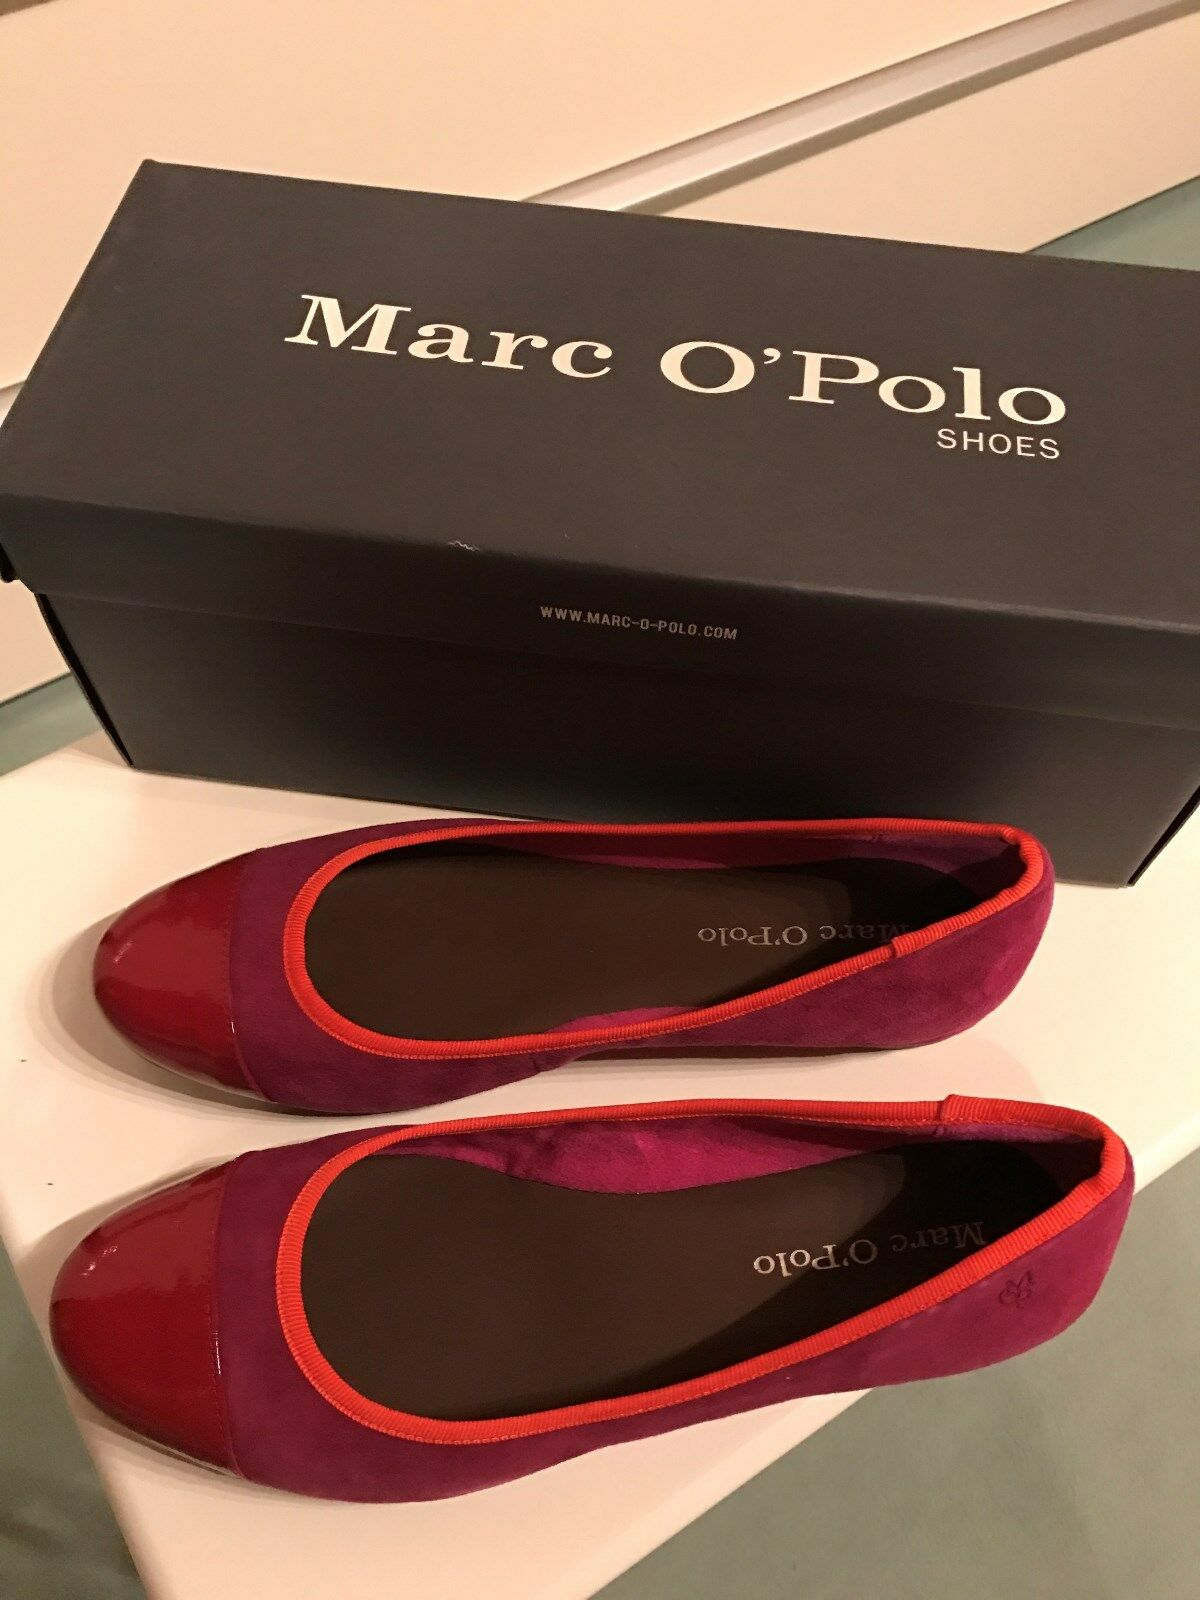 Damen Größe Schuhe Ballerina, Marco Polo, Neu, Leder, Größe Damen 5,5 b894db